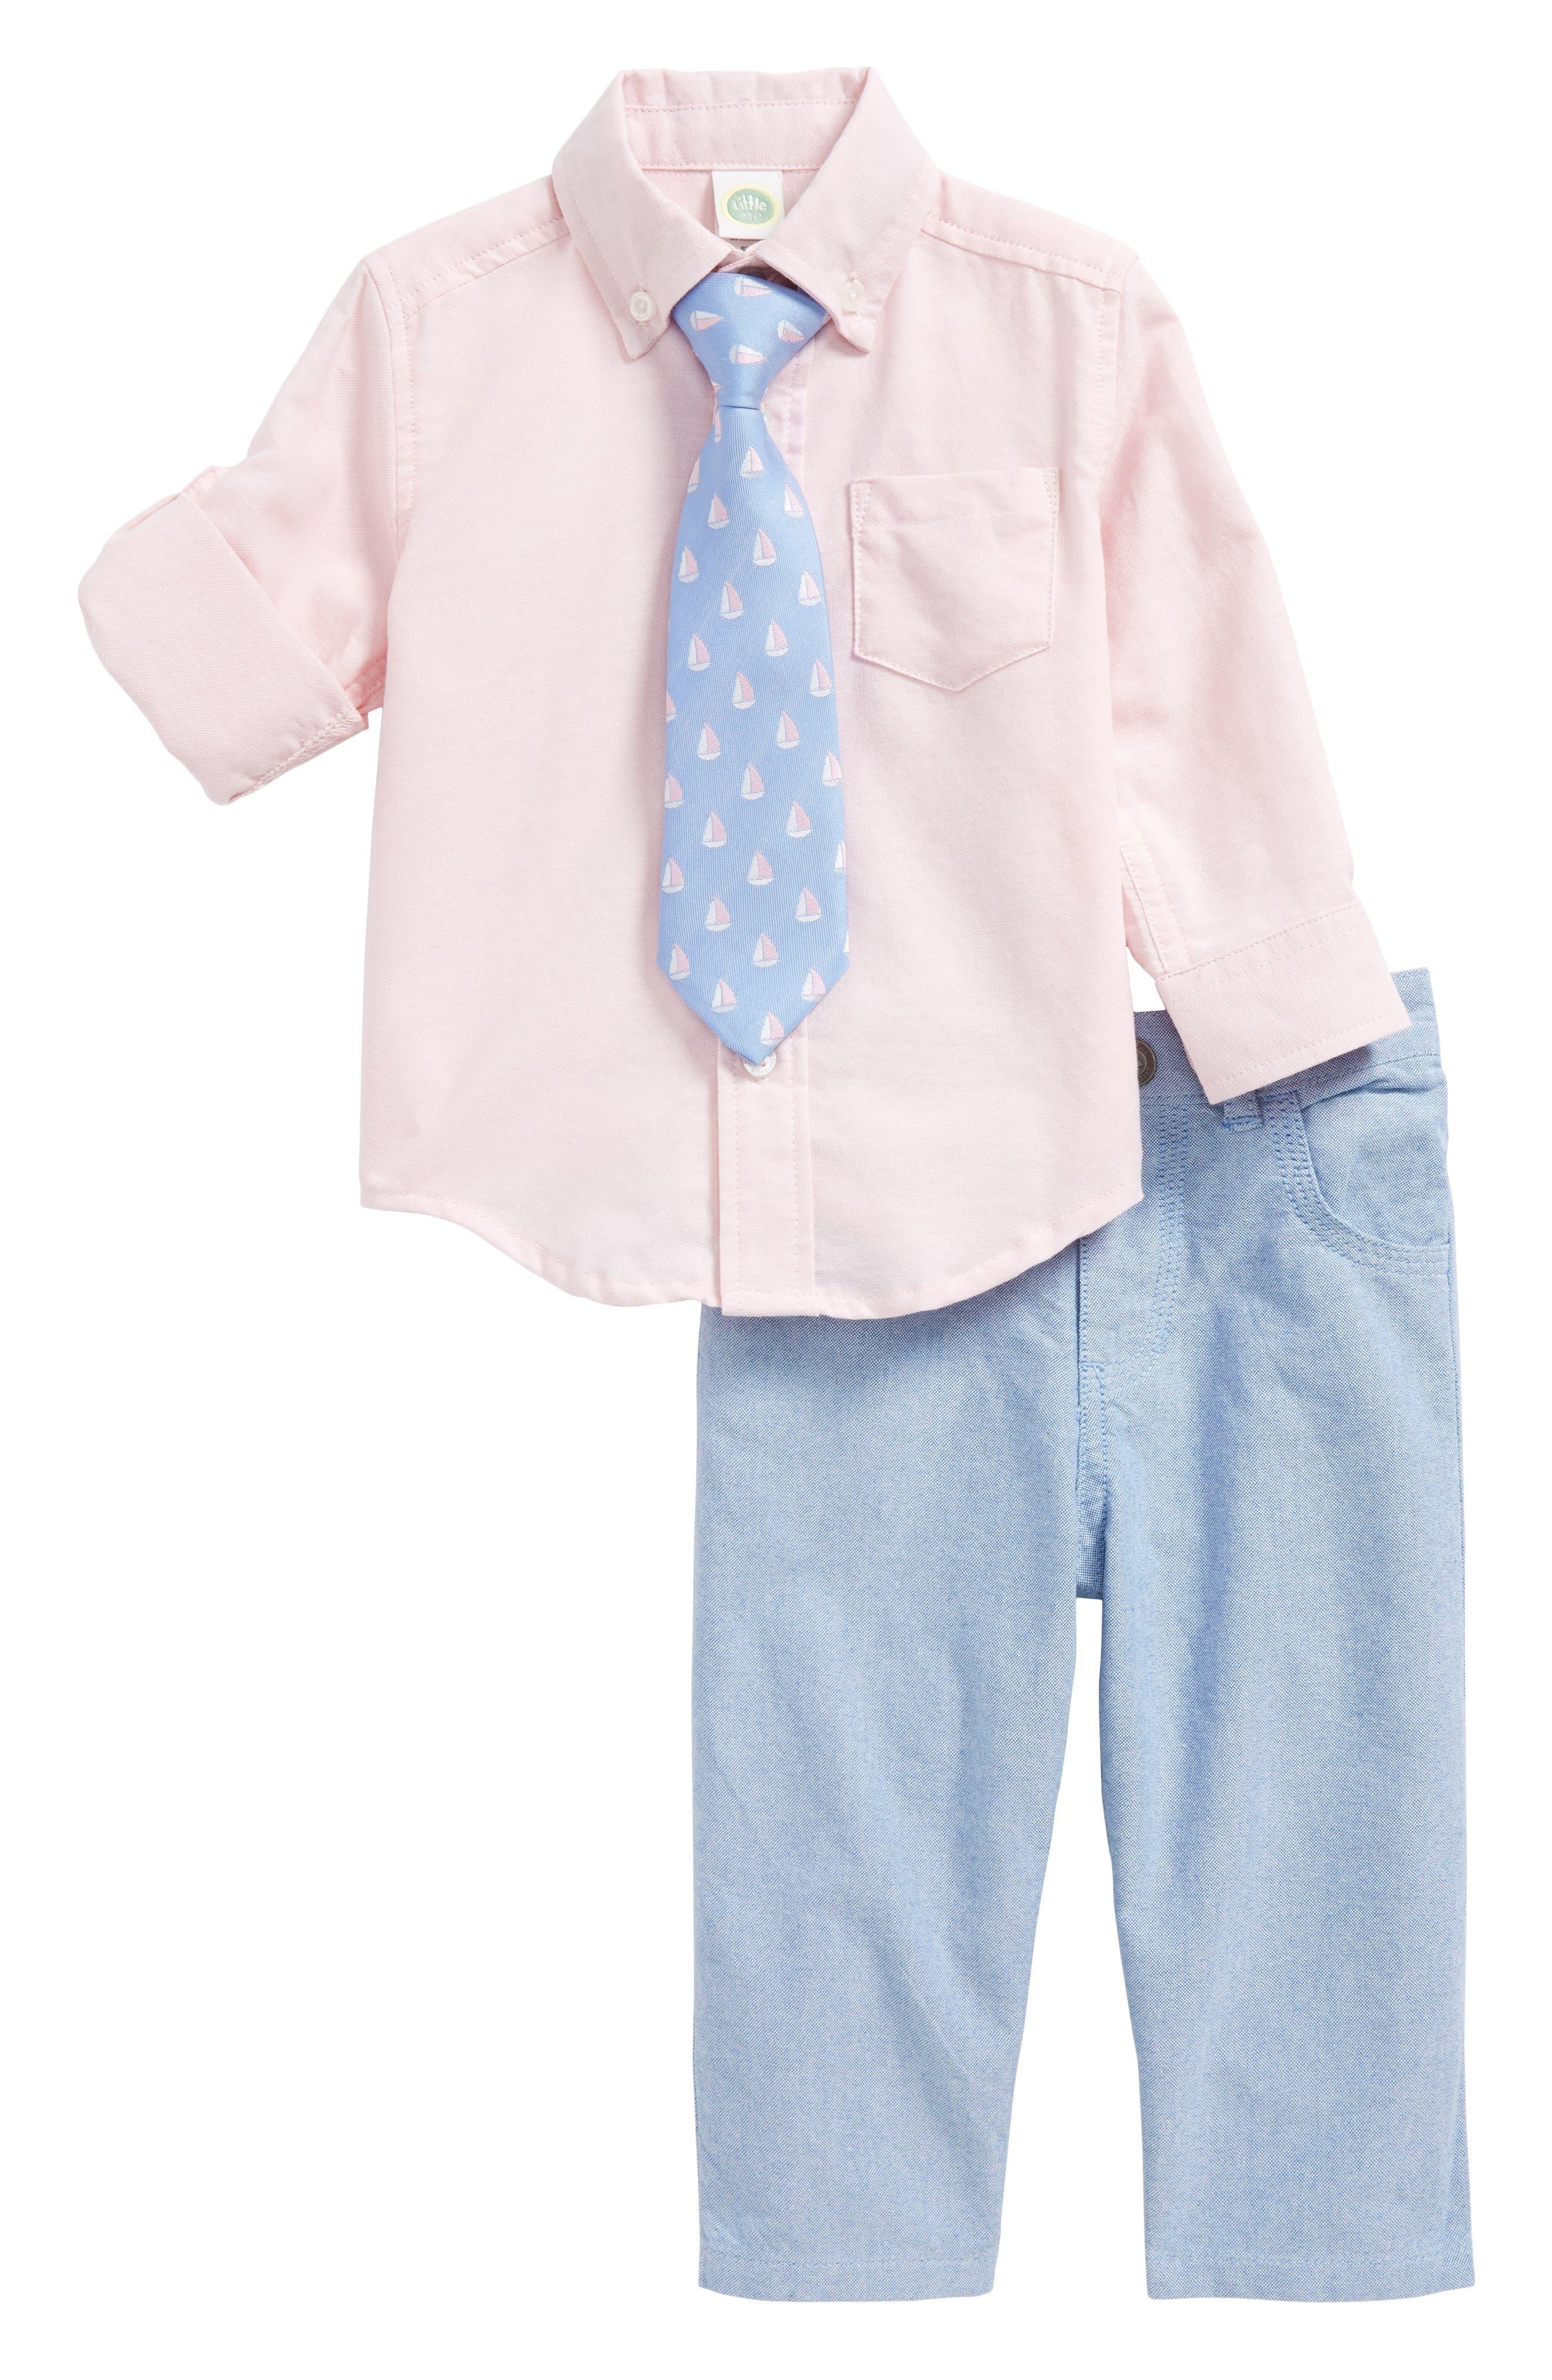 Little Me Oxford Shirt, Pants & Tie Set (Baby Boys)